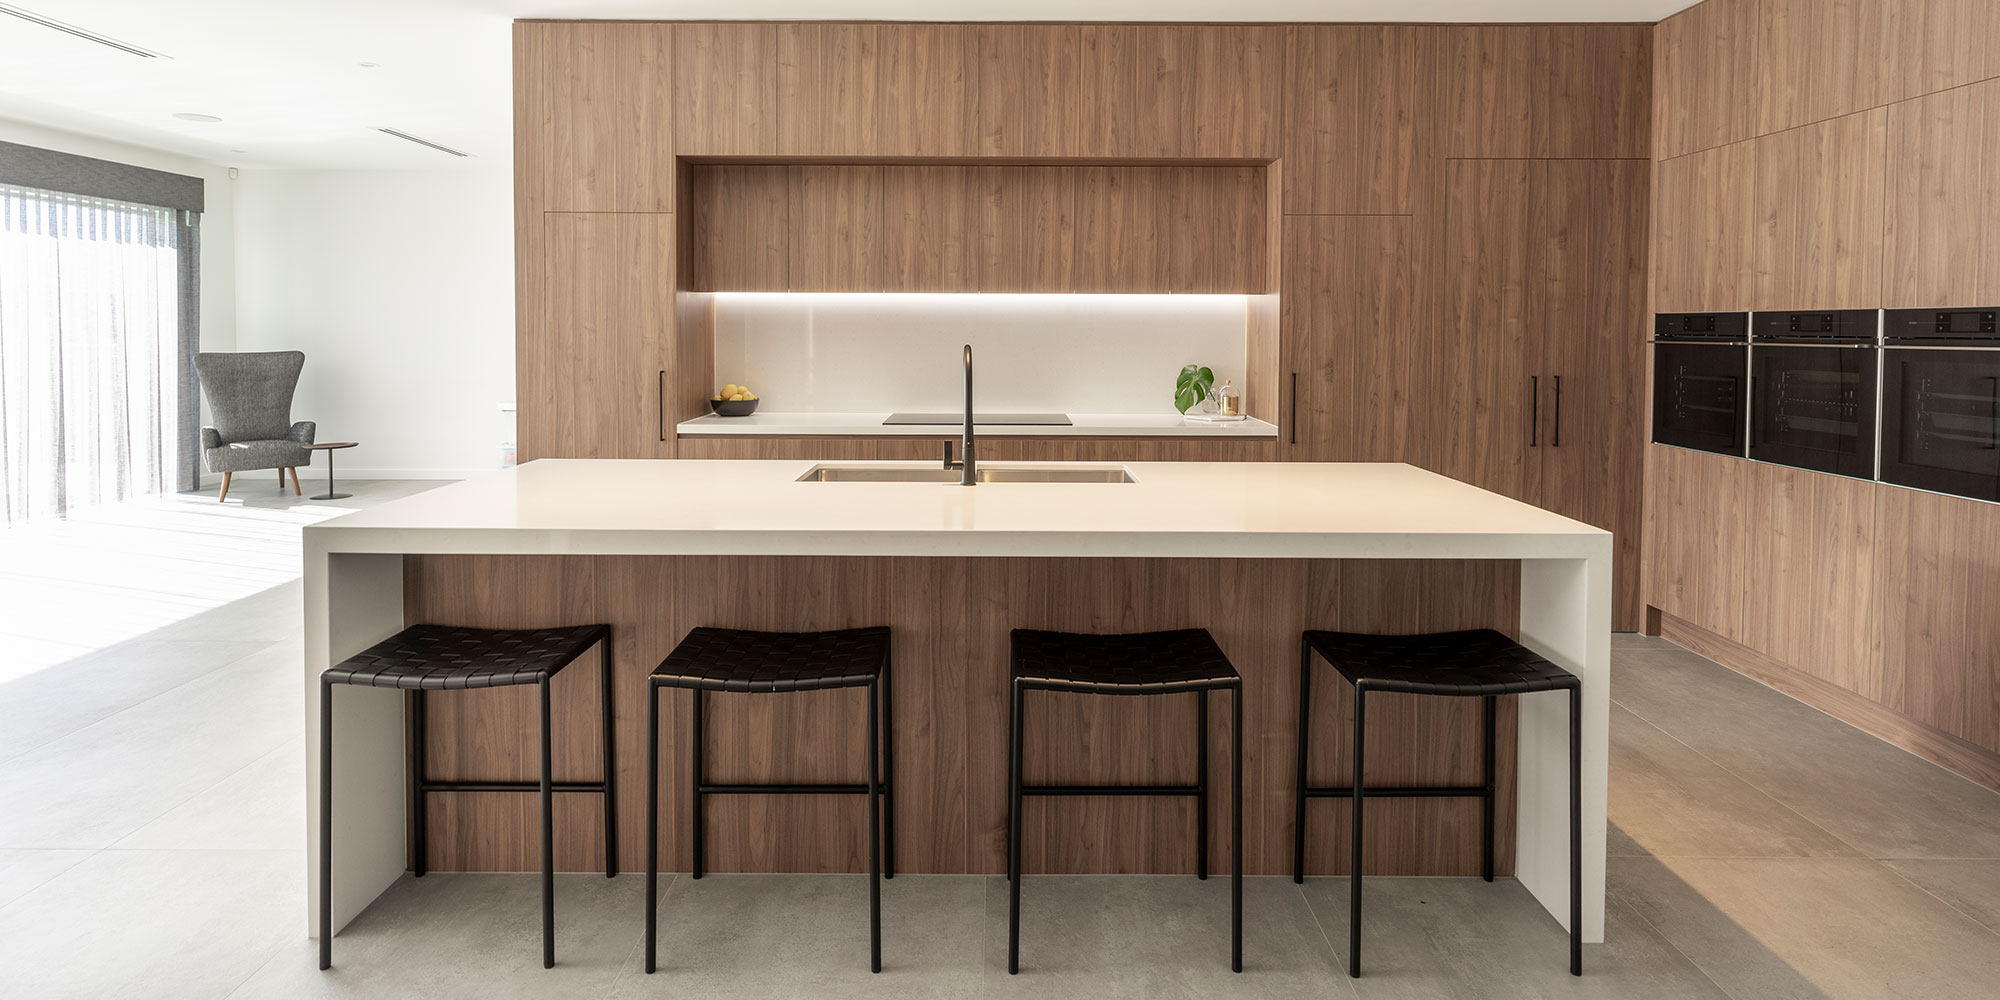 kitchens-1k-8